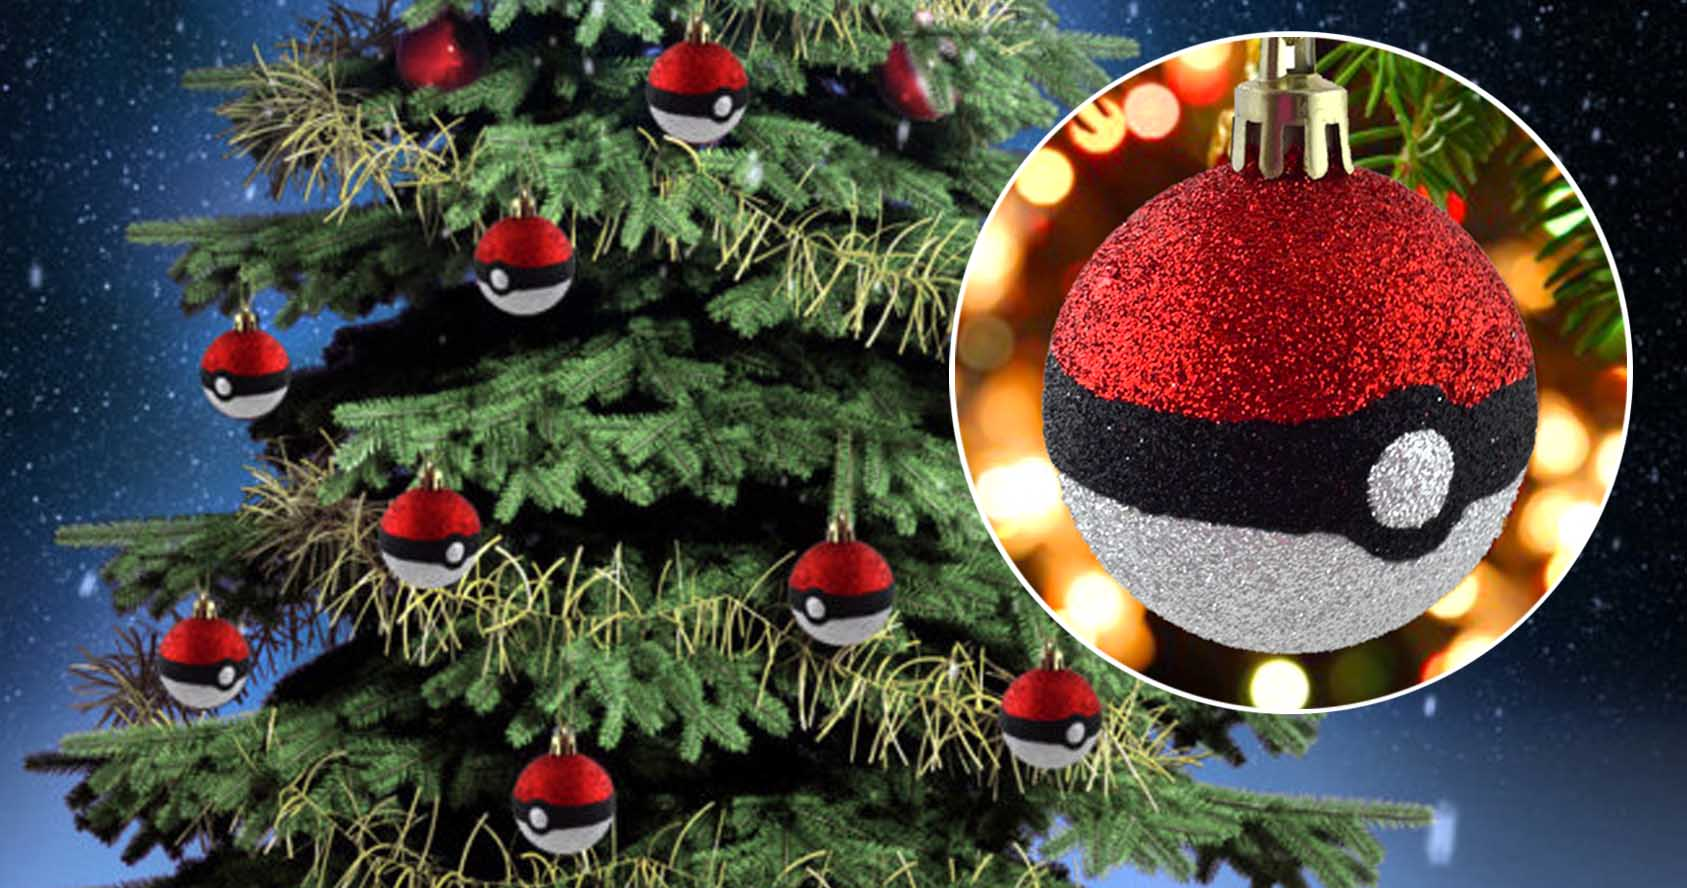 Pokeball Christmas Tree Ornaments - Shut Up And Take My Yen